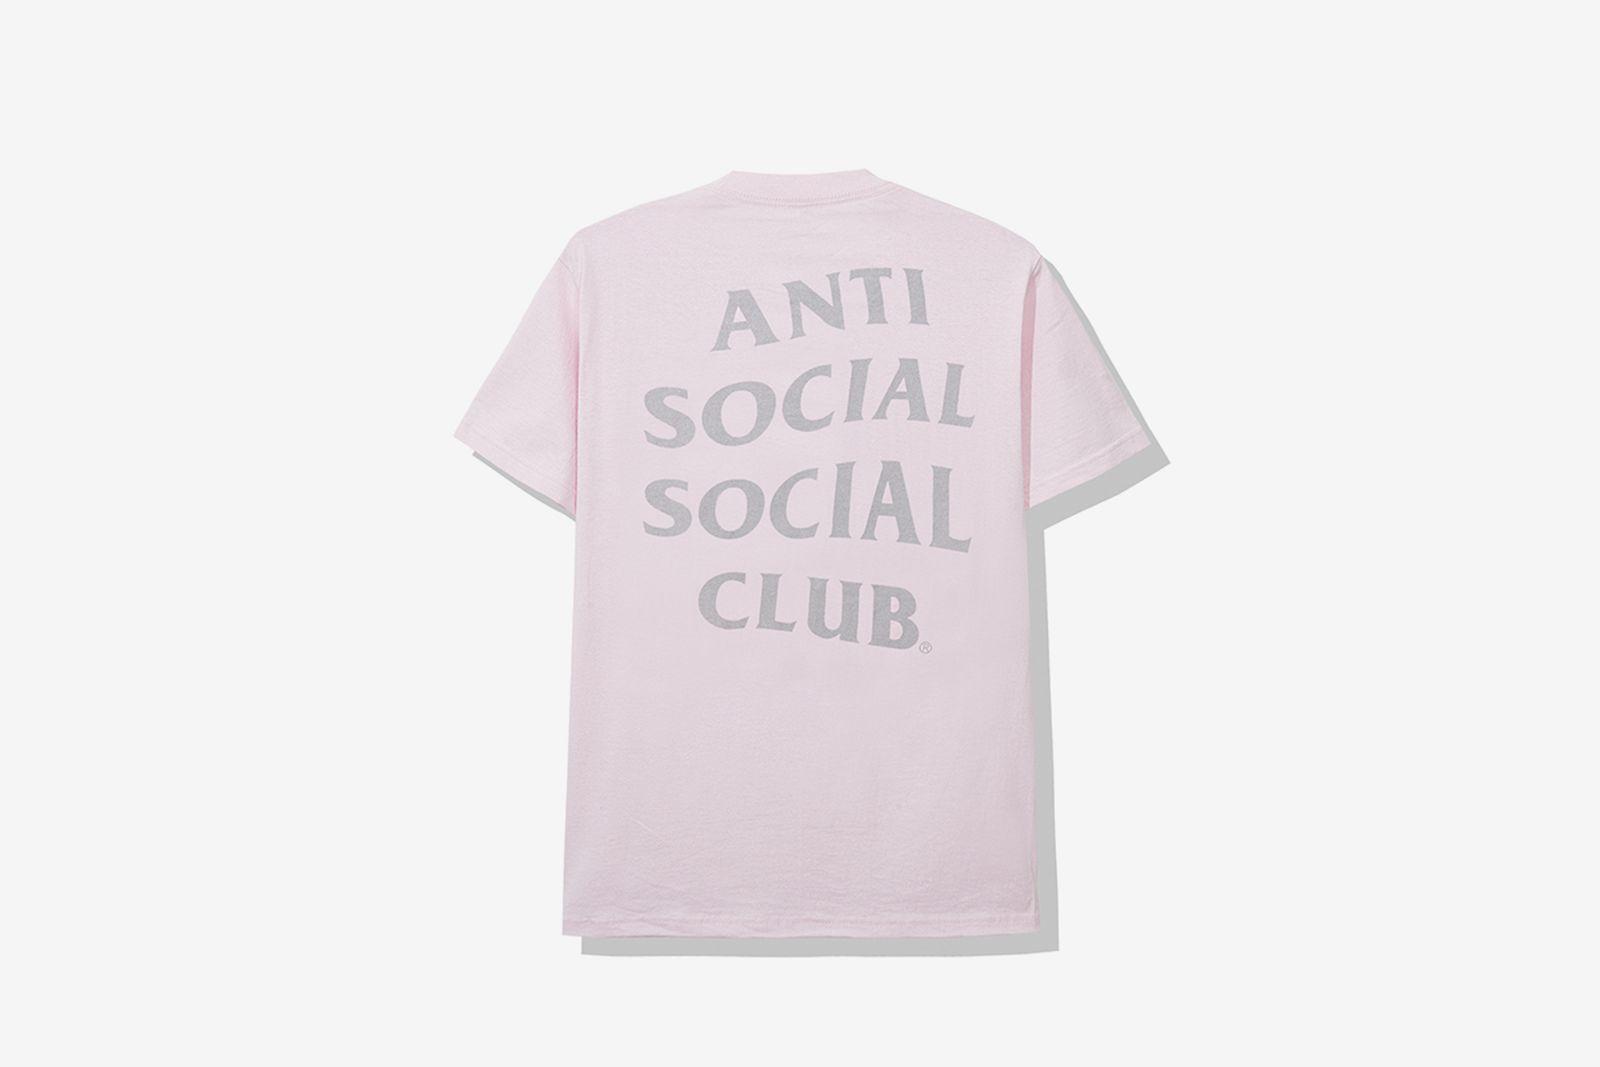 anti-social-social-club-usps-collaboration-2-12